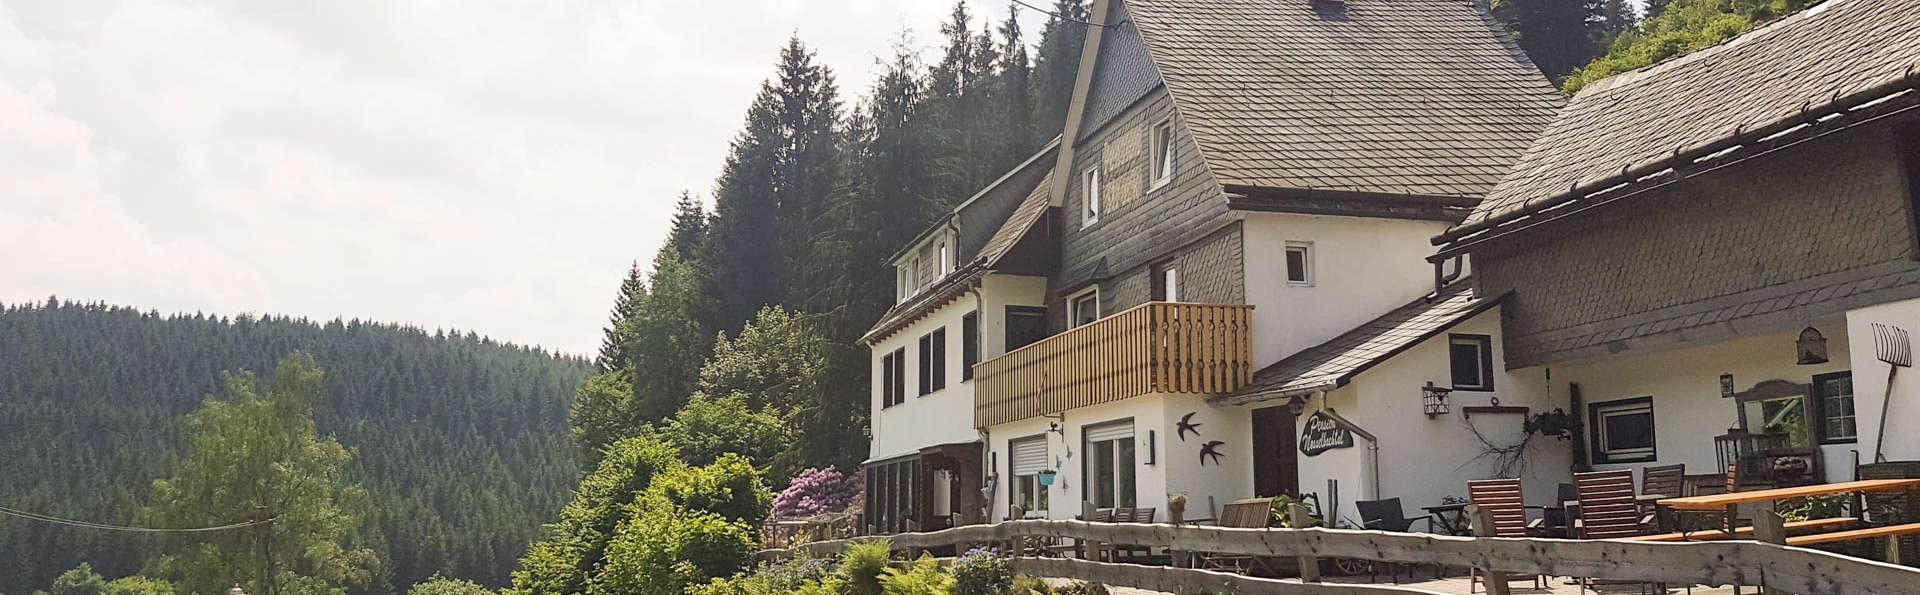 Landgasthof Nesselbach - EDIT_Exterior-4.jpg